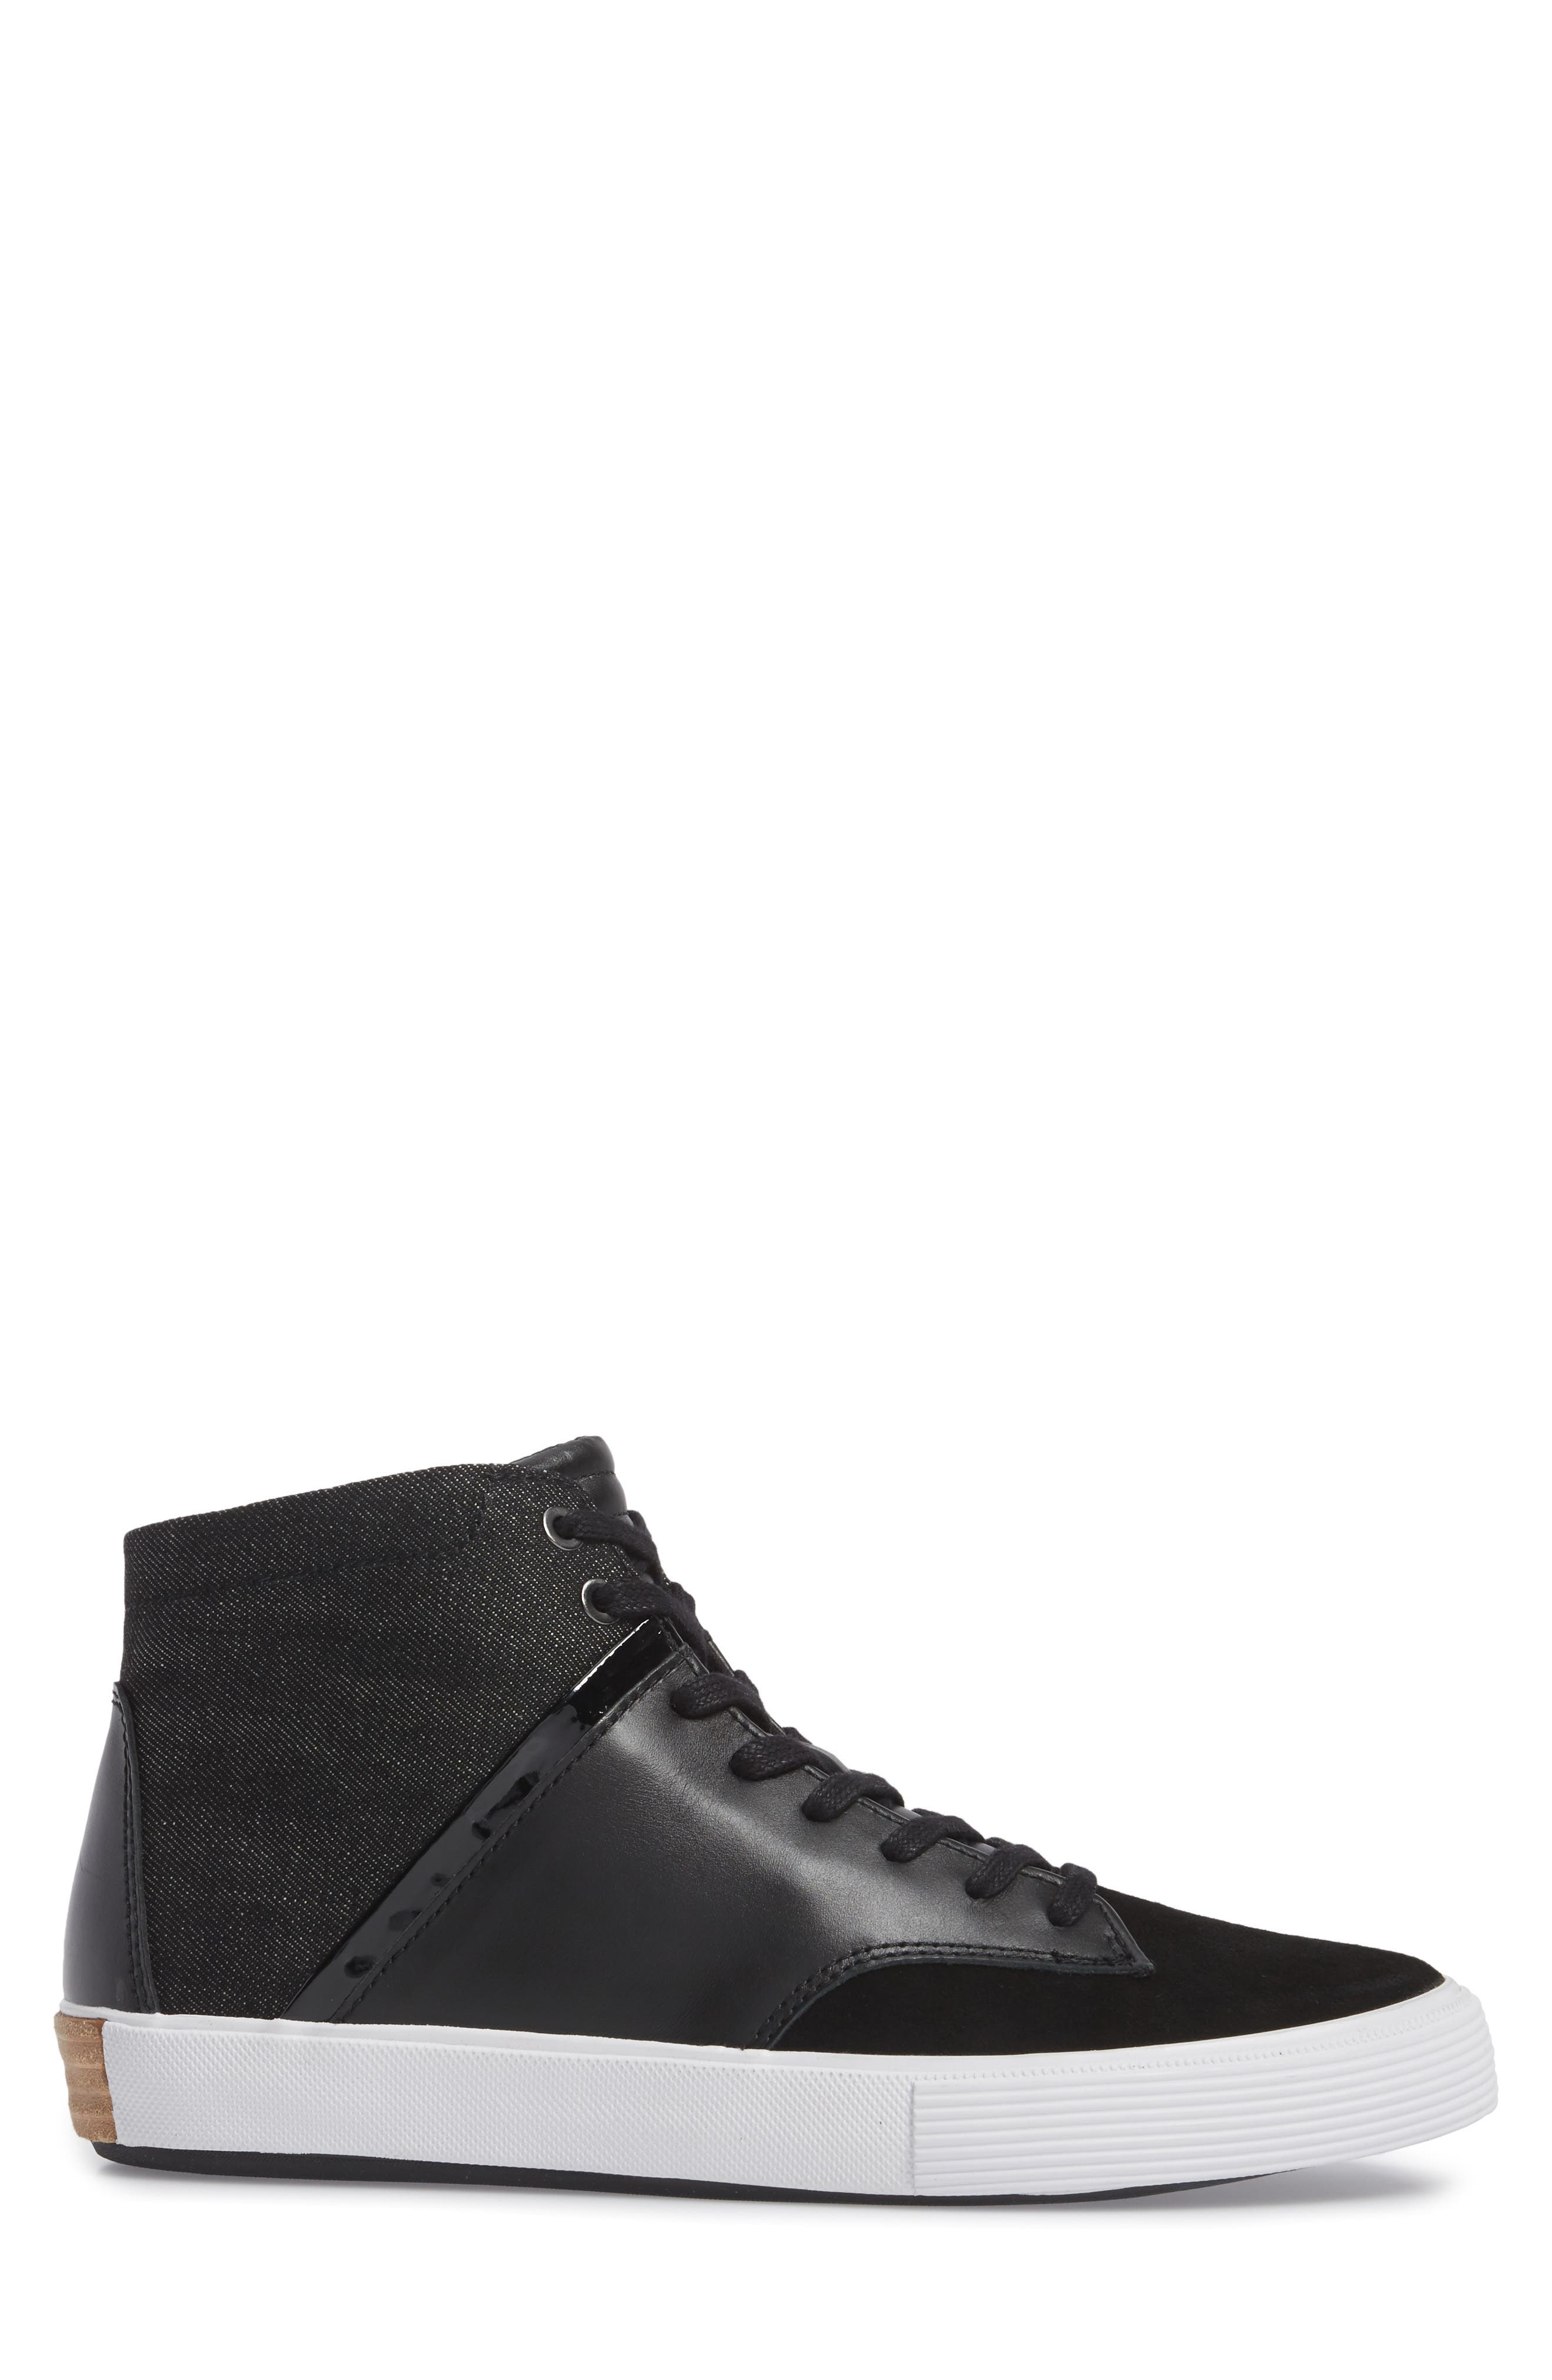 Joe Mac High Top Sneaker,                             Alternate thumbnail 3, color,                             Black Leather